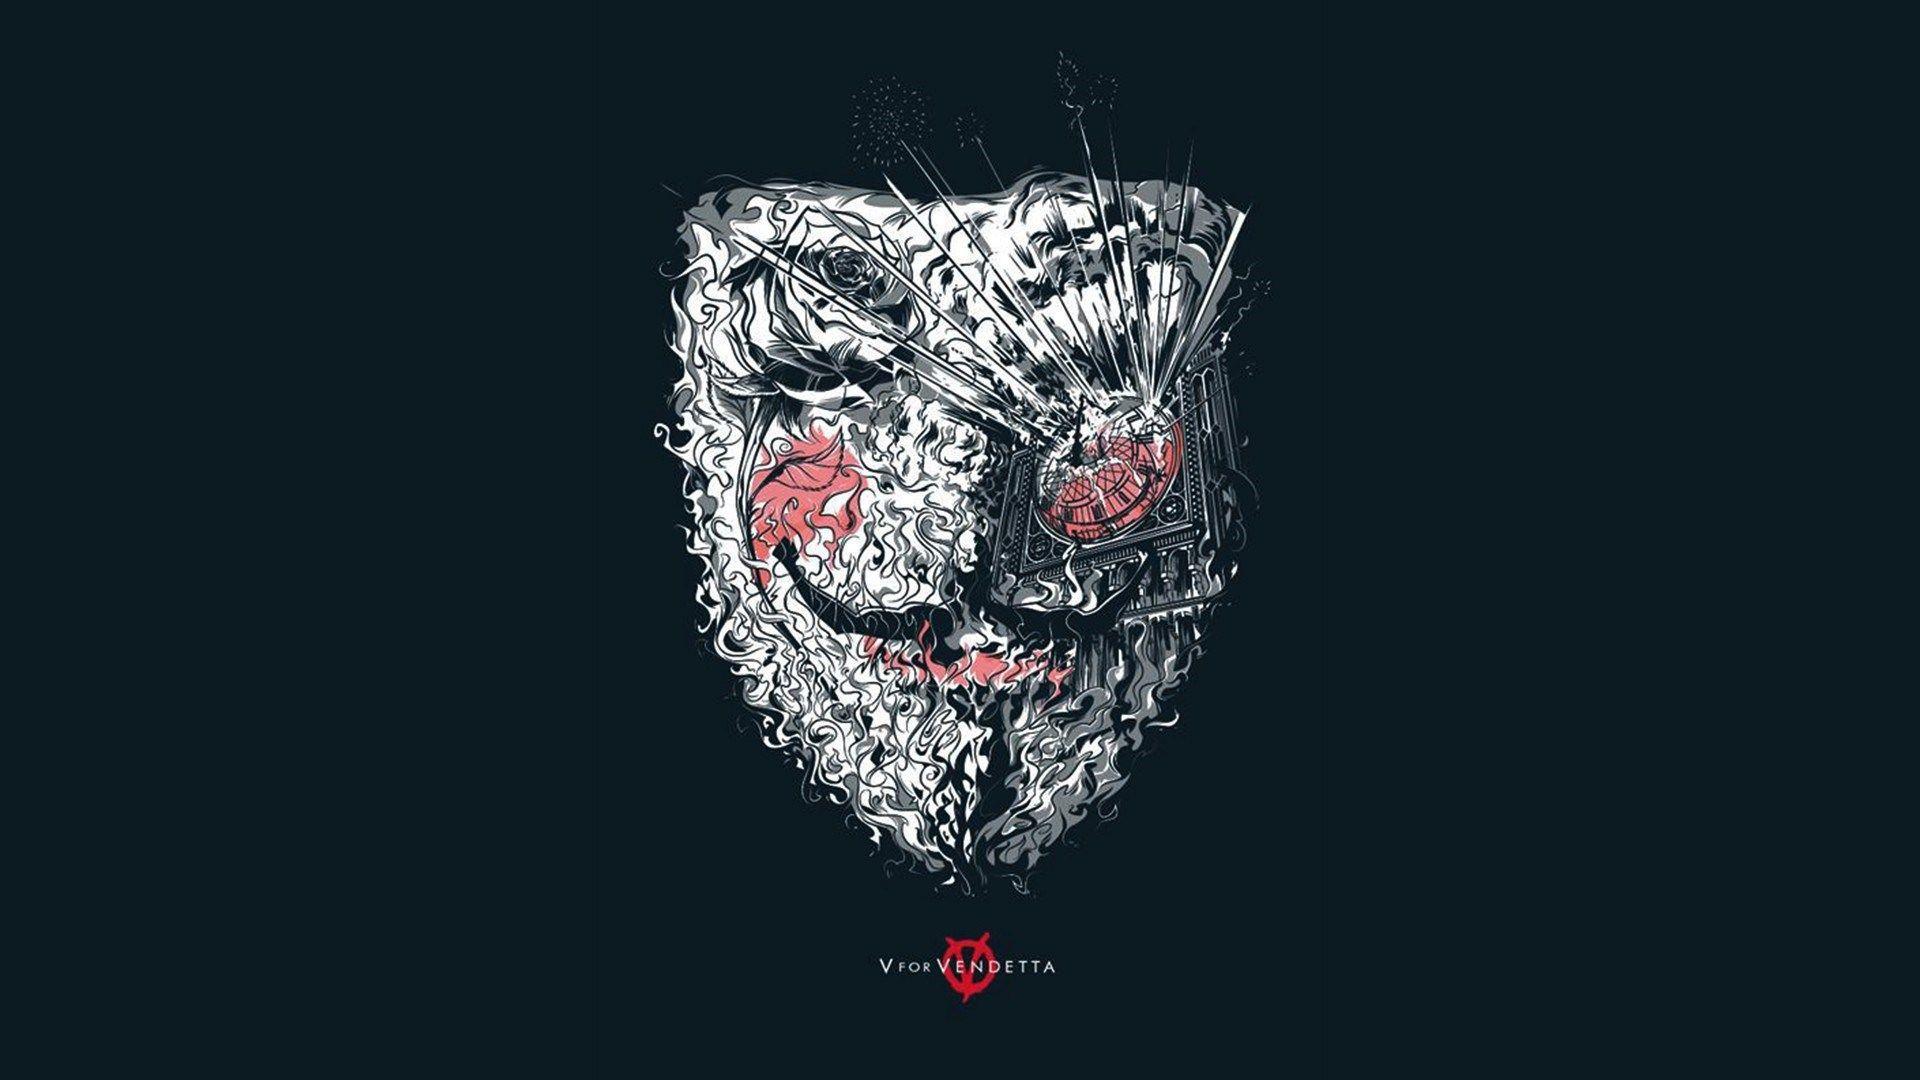 Vendetta Mask Wallpaper HD 22255